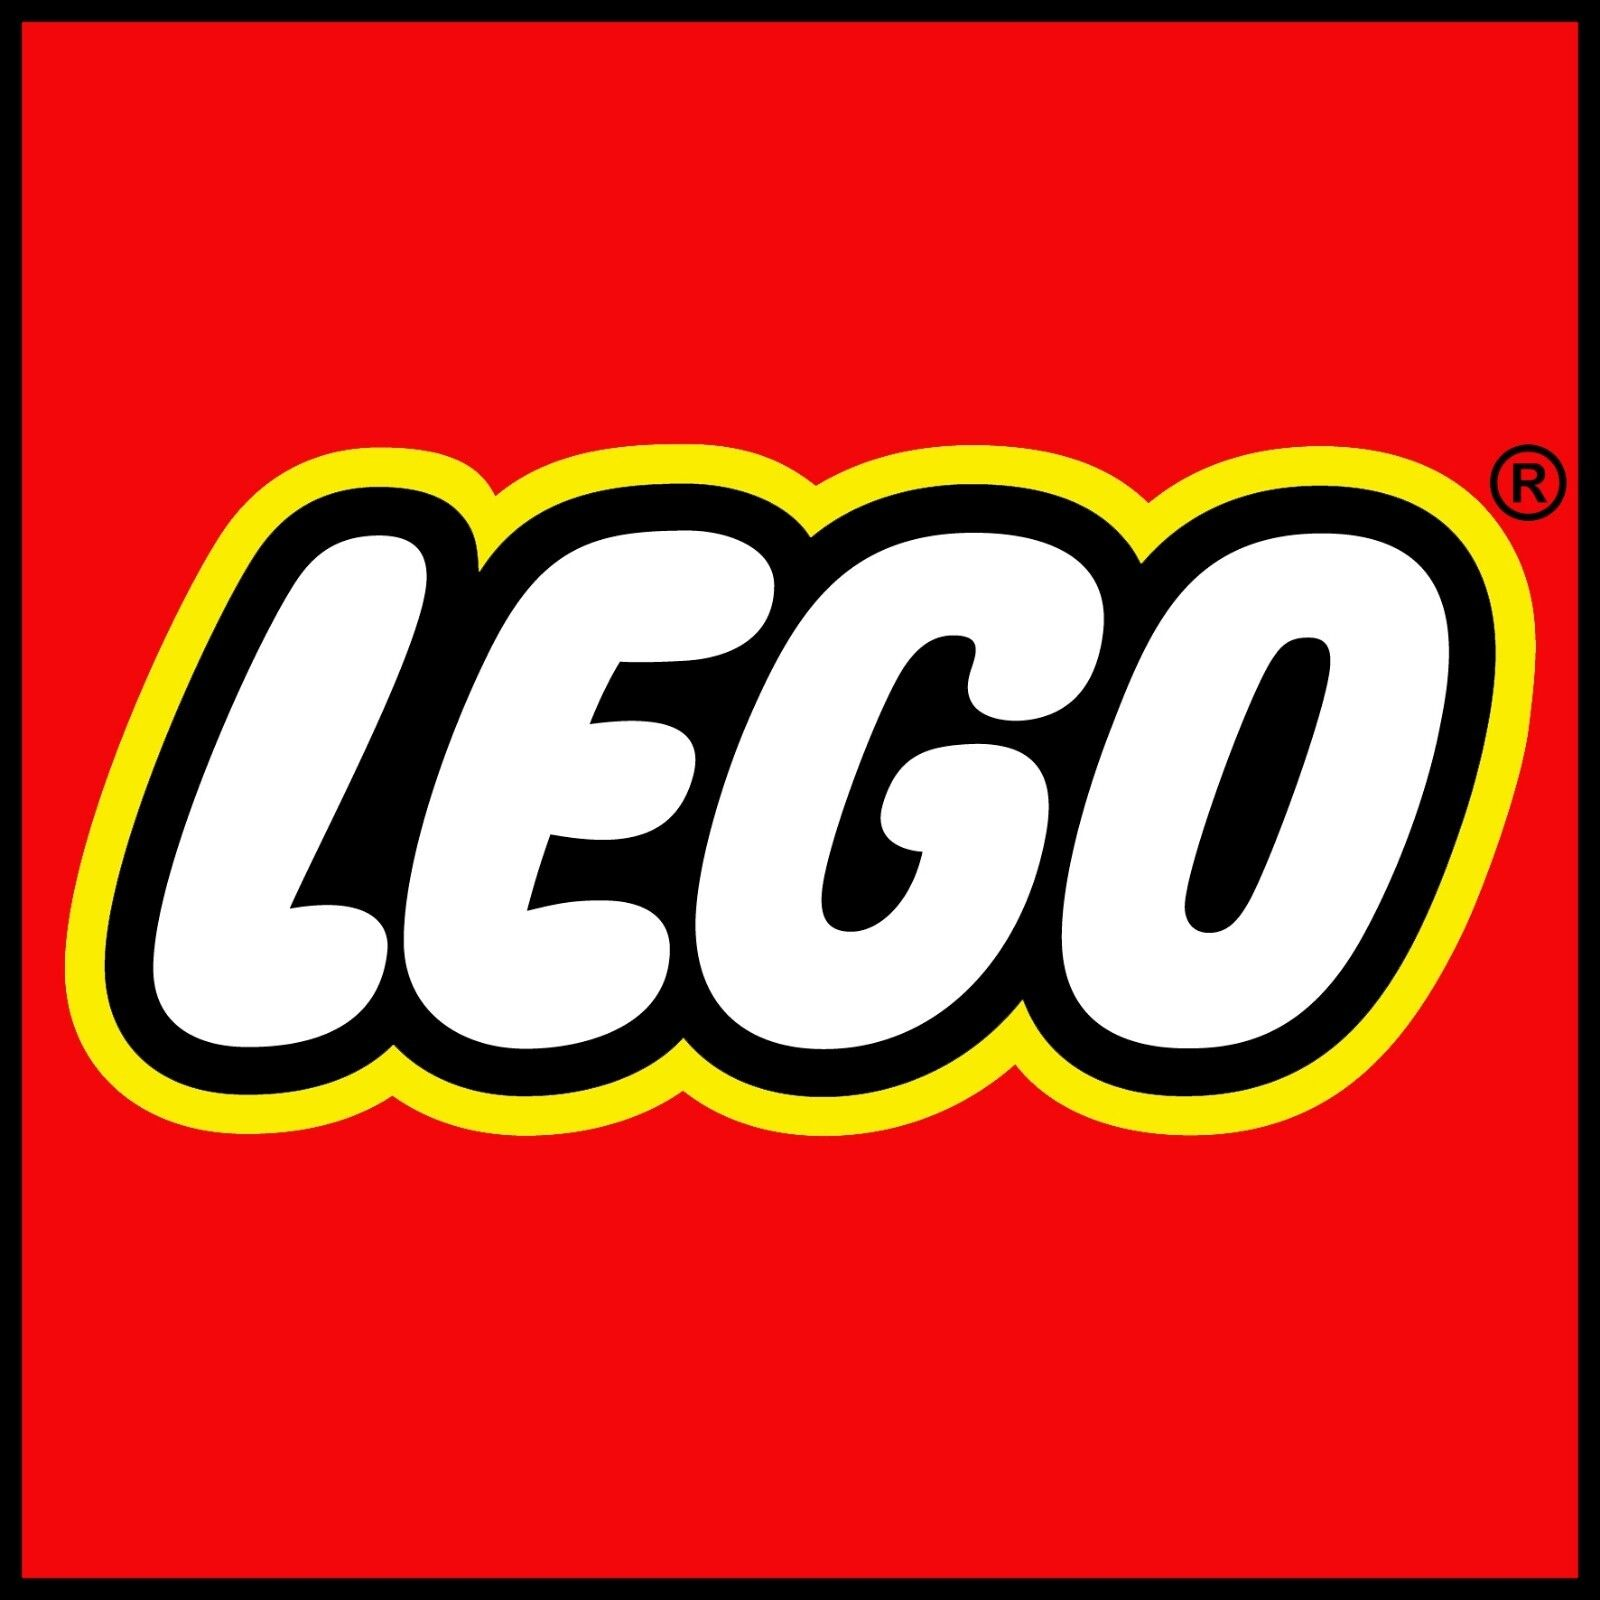 LEGO - Lot 32 ()